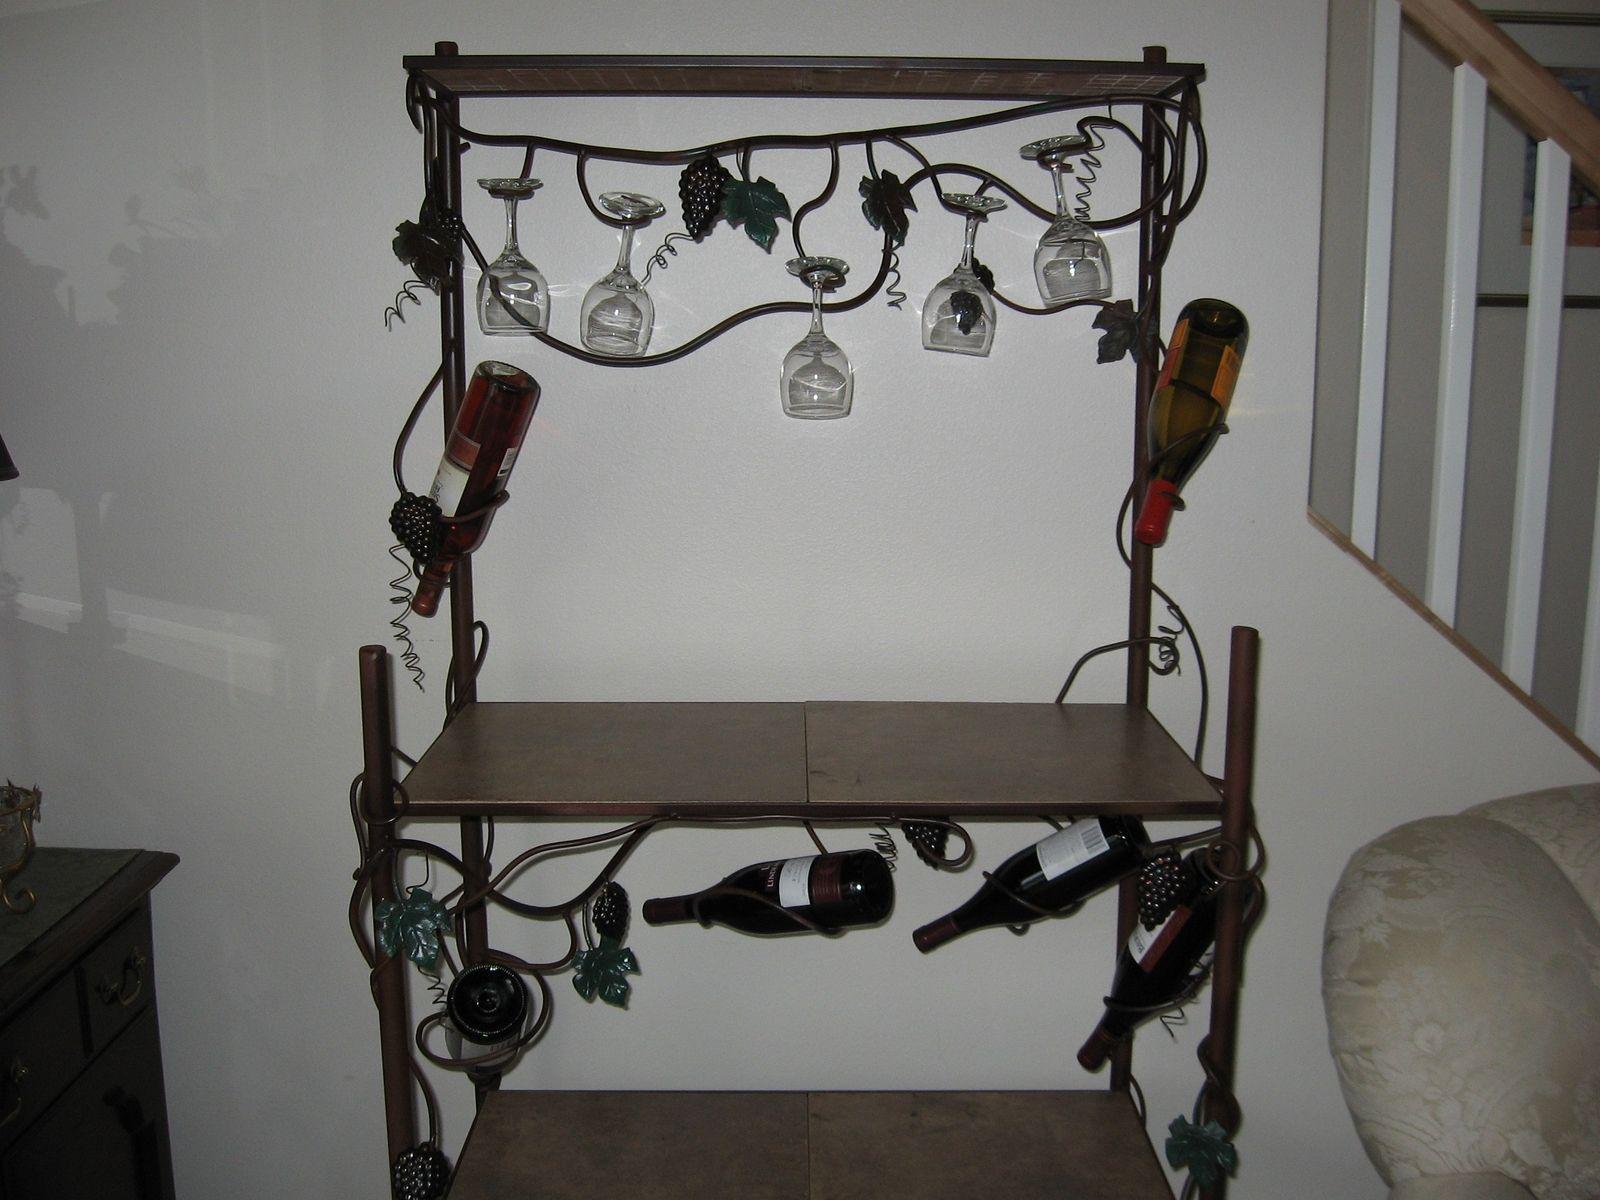 Bakers rack decorating ideas - Custom Made Bakers Rack Wine Rack